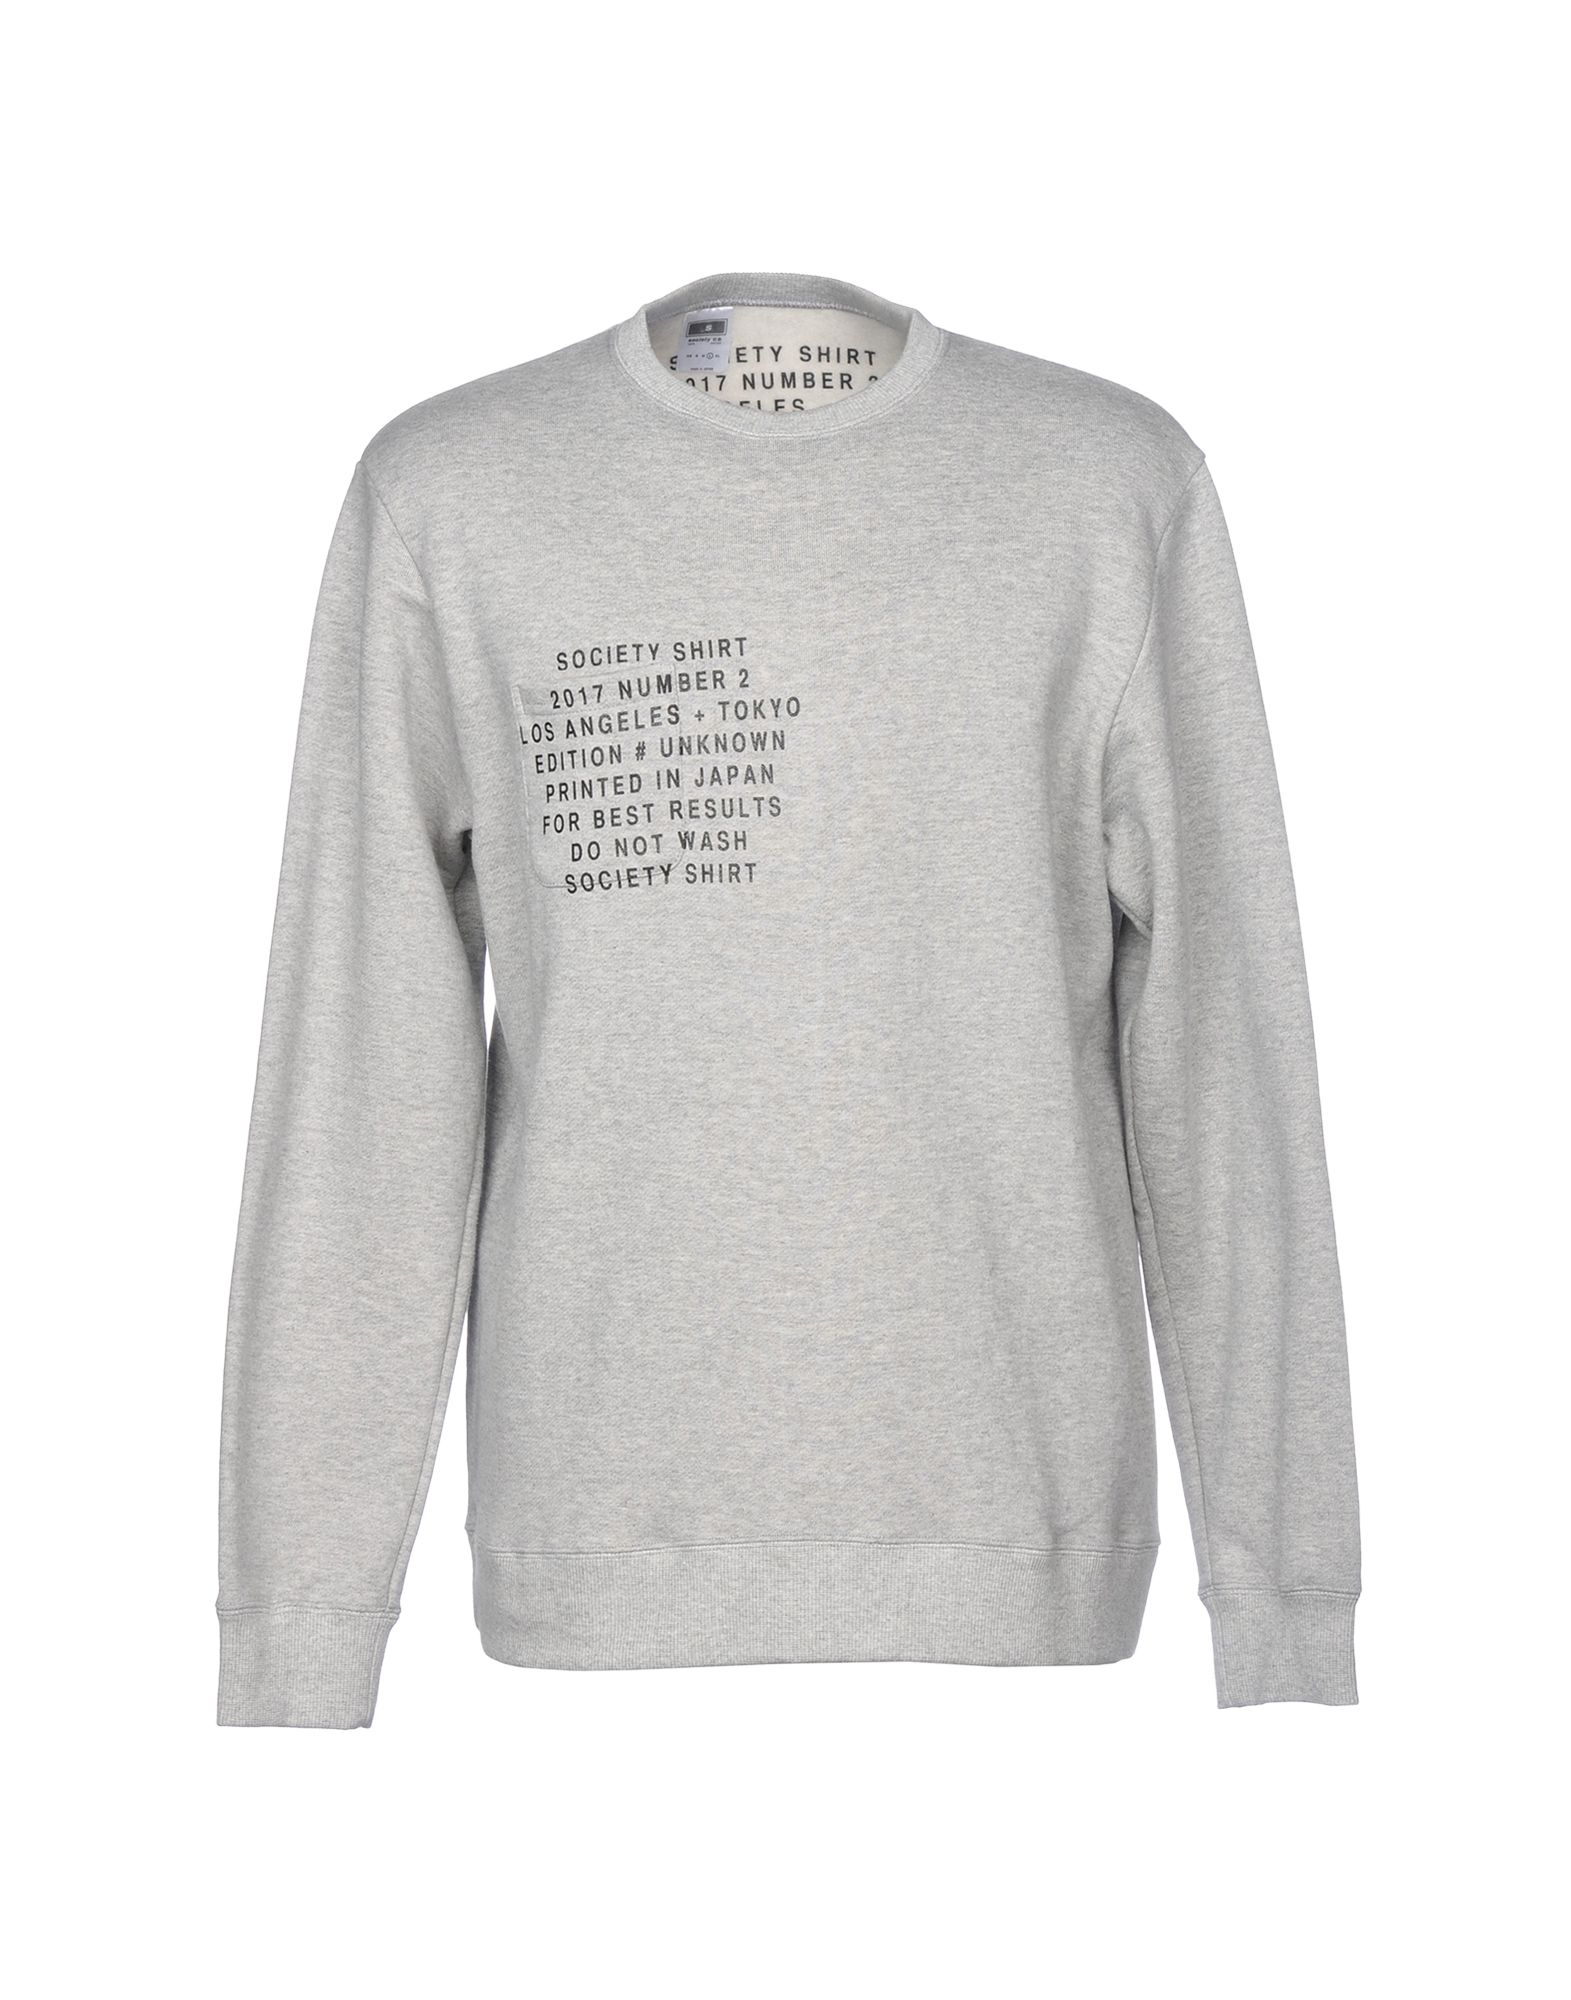 SOCIETY Sweatshirt in Light Grey